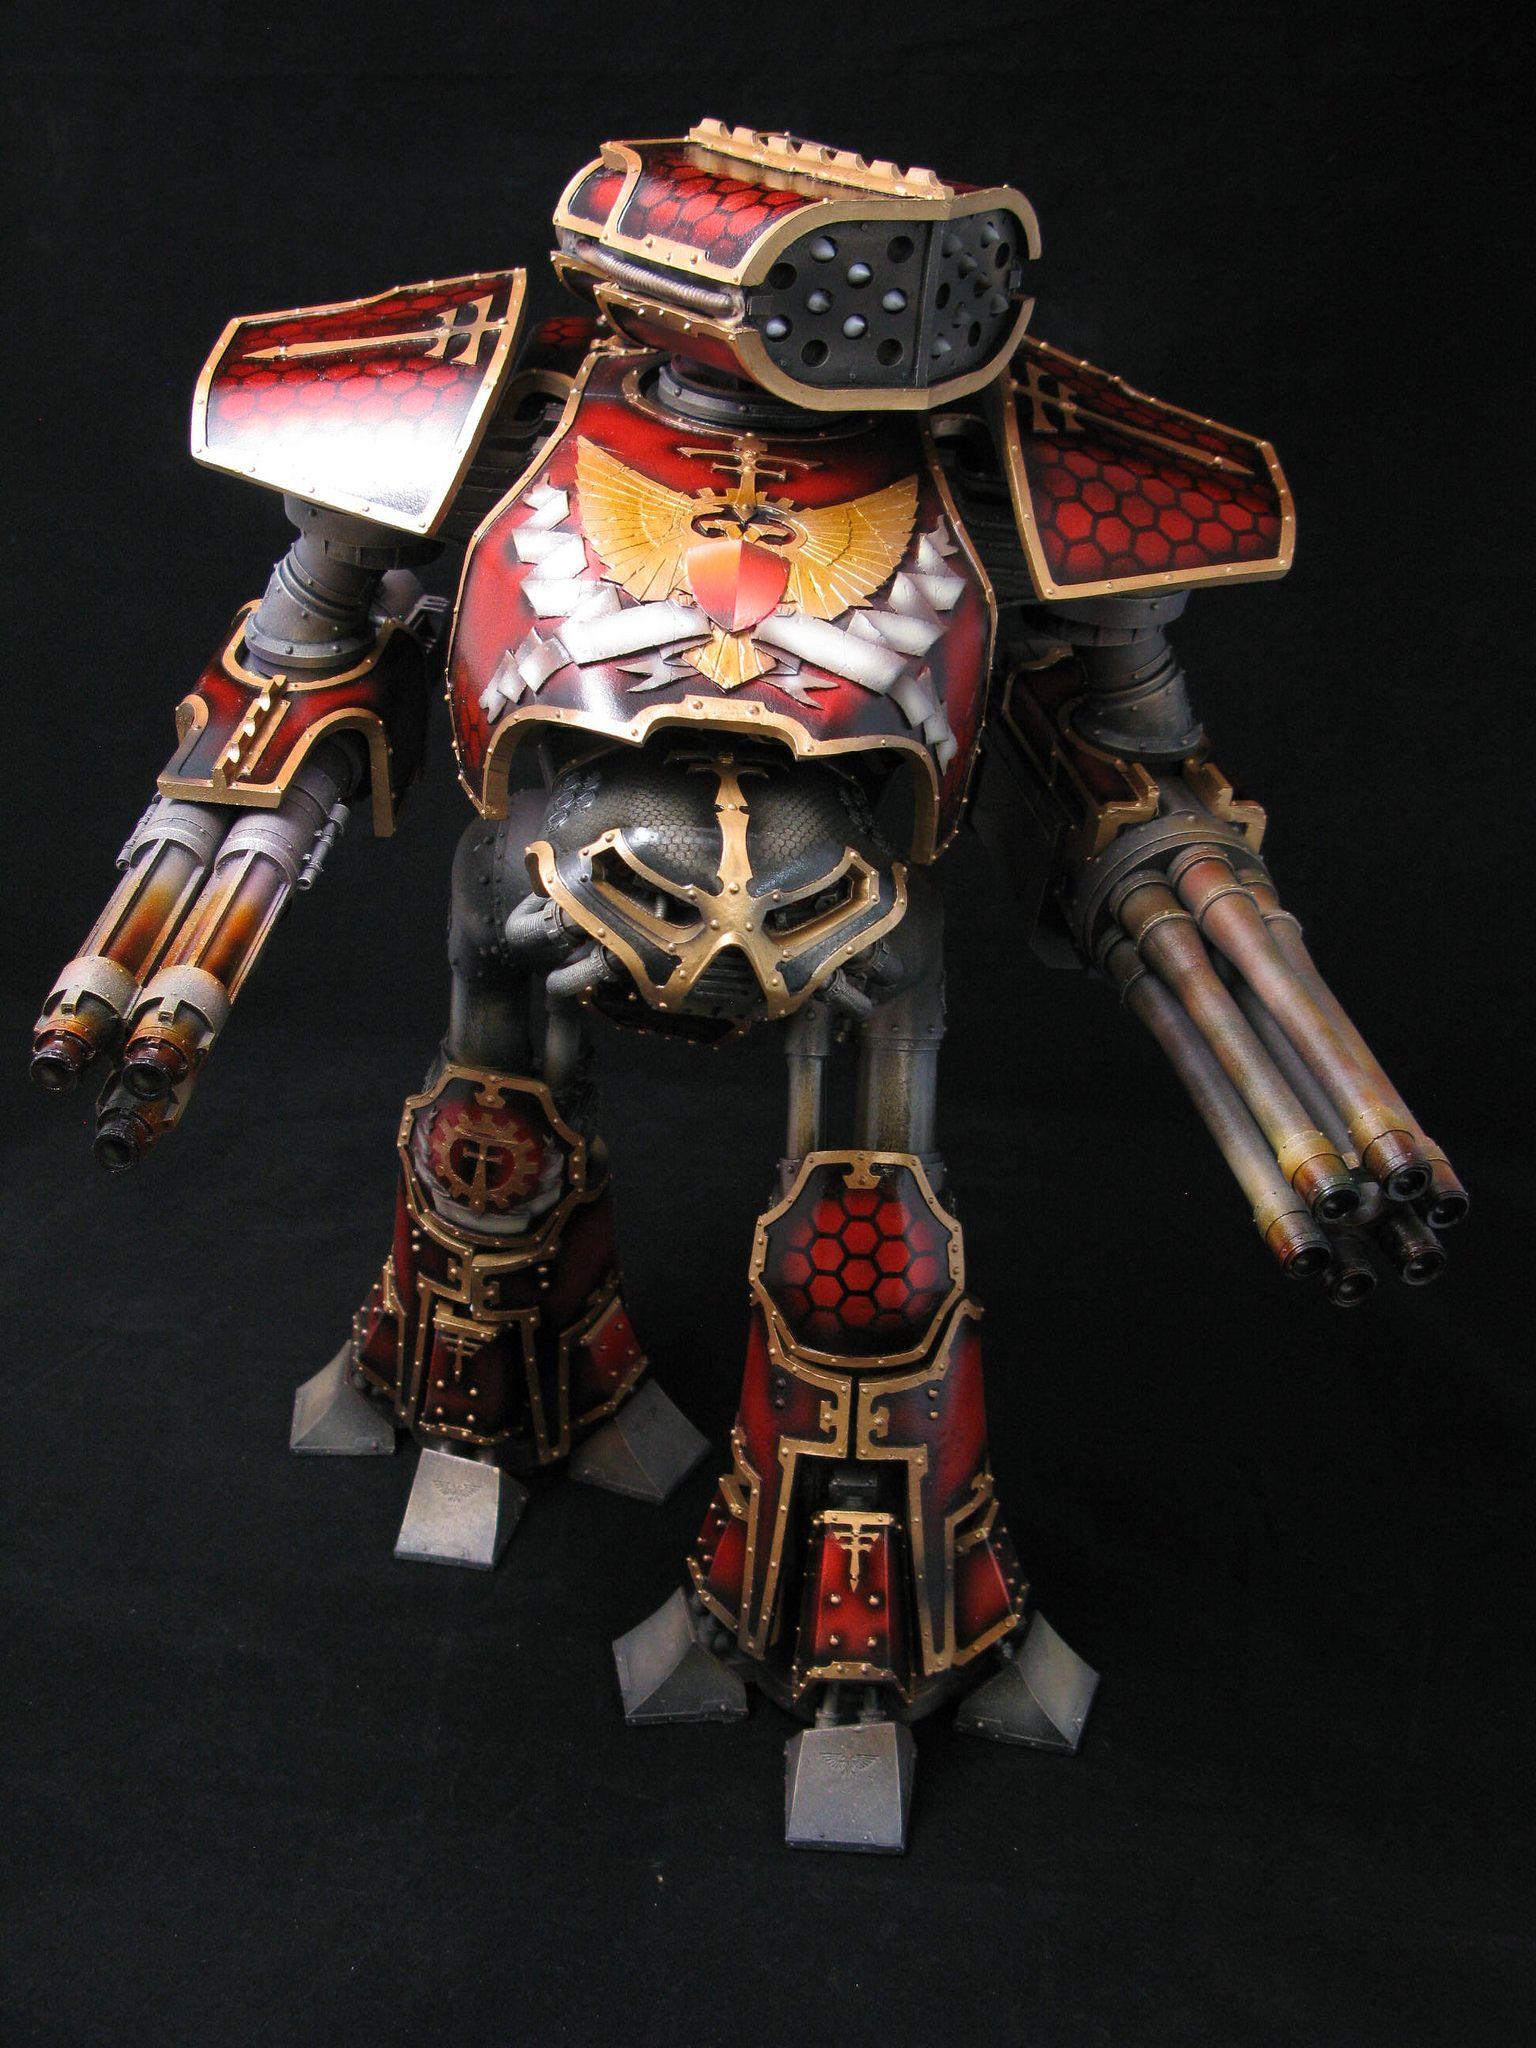 Fully magnetized Imperial Reaver Titan